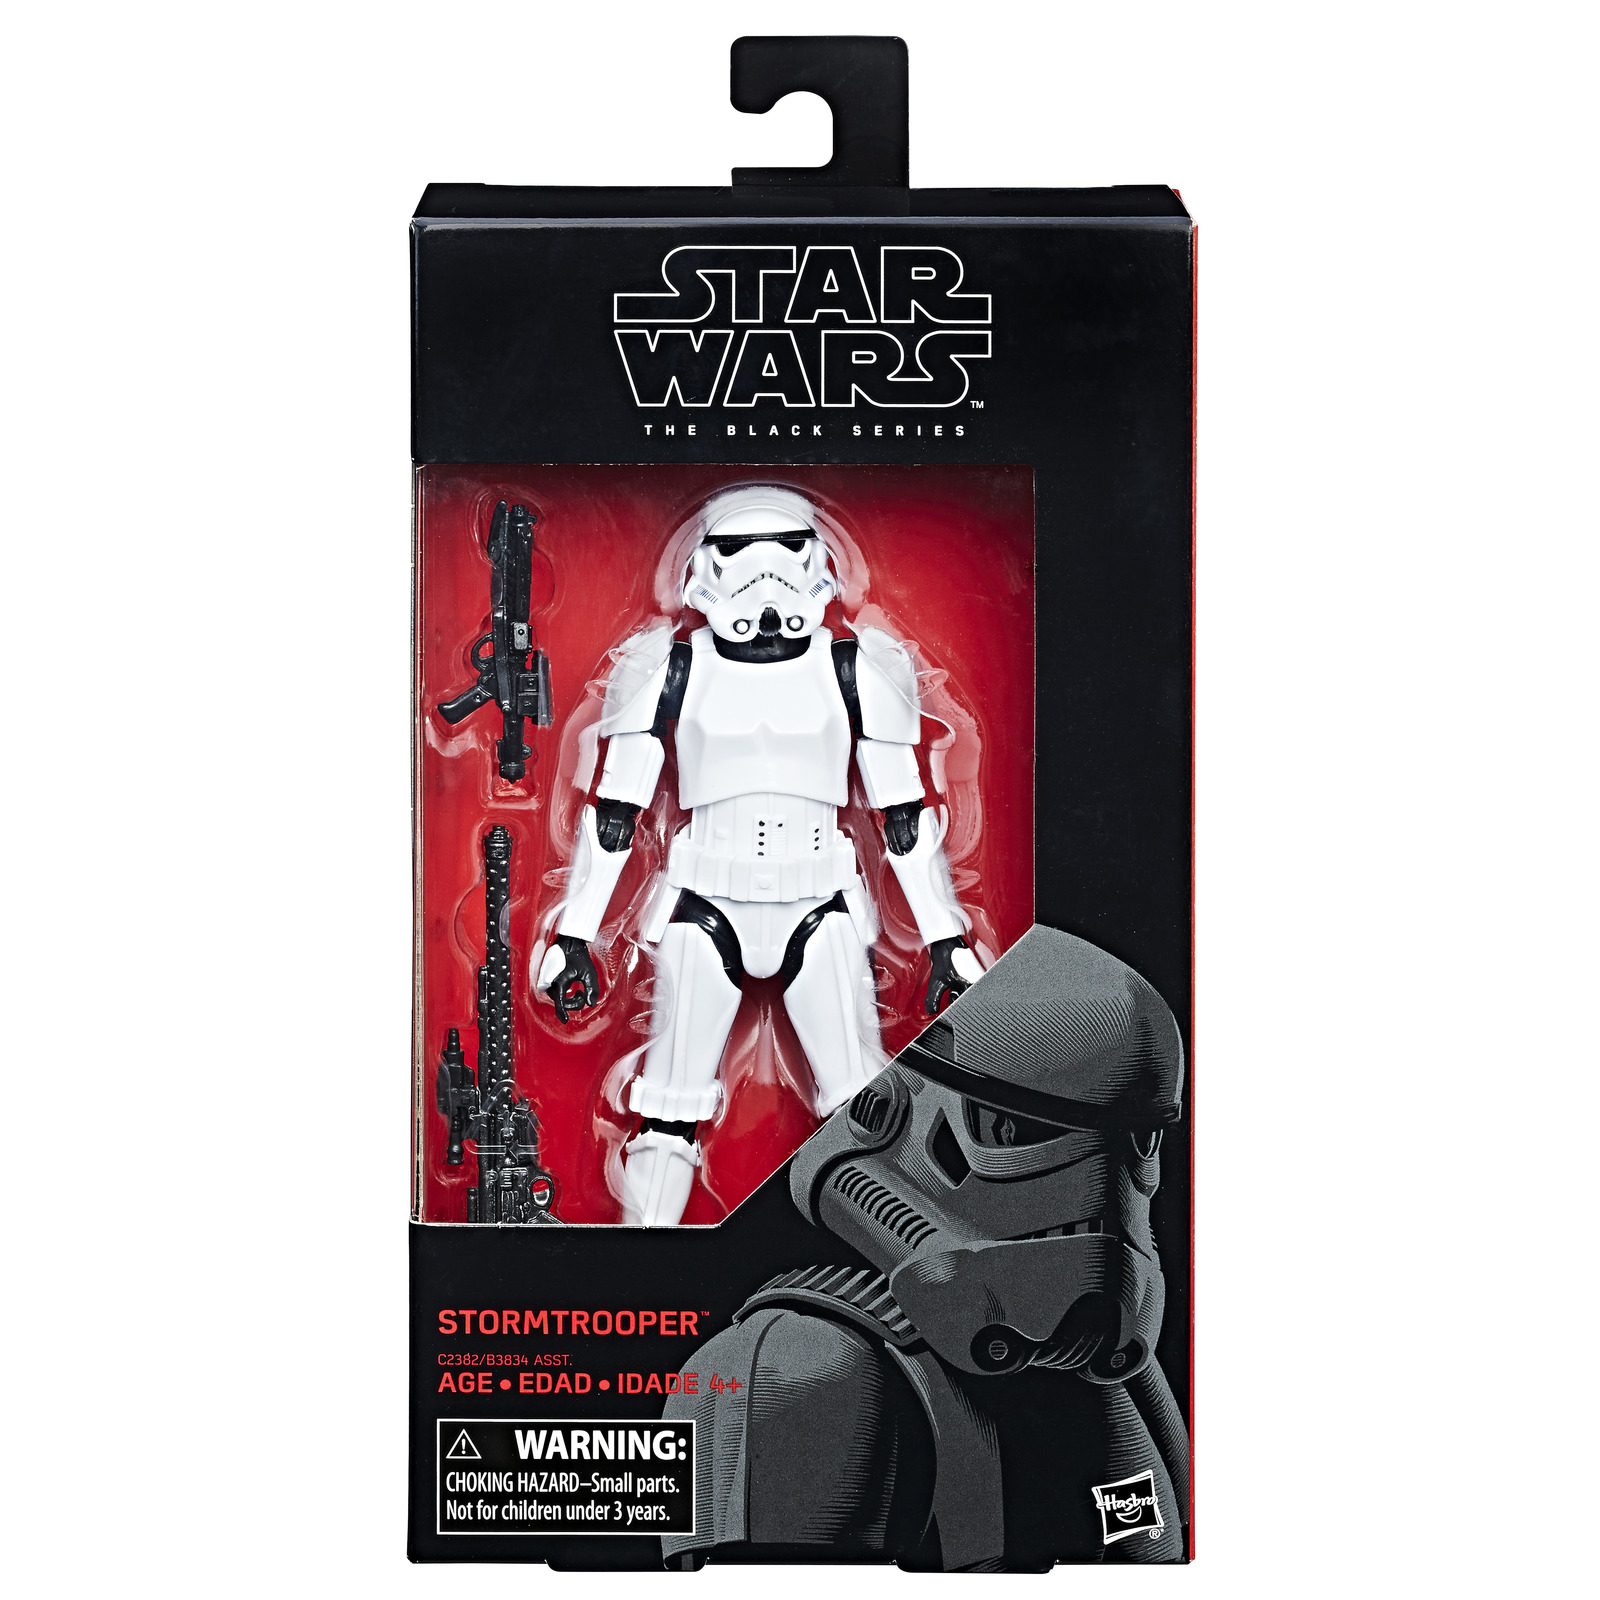 Star Wars: The Black Series - Stormtrooper (#48) image